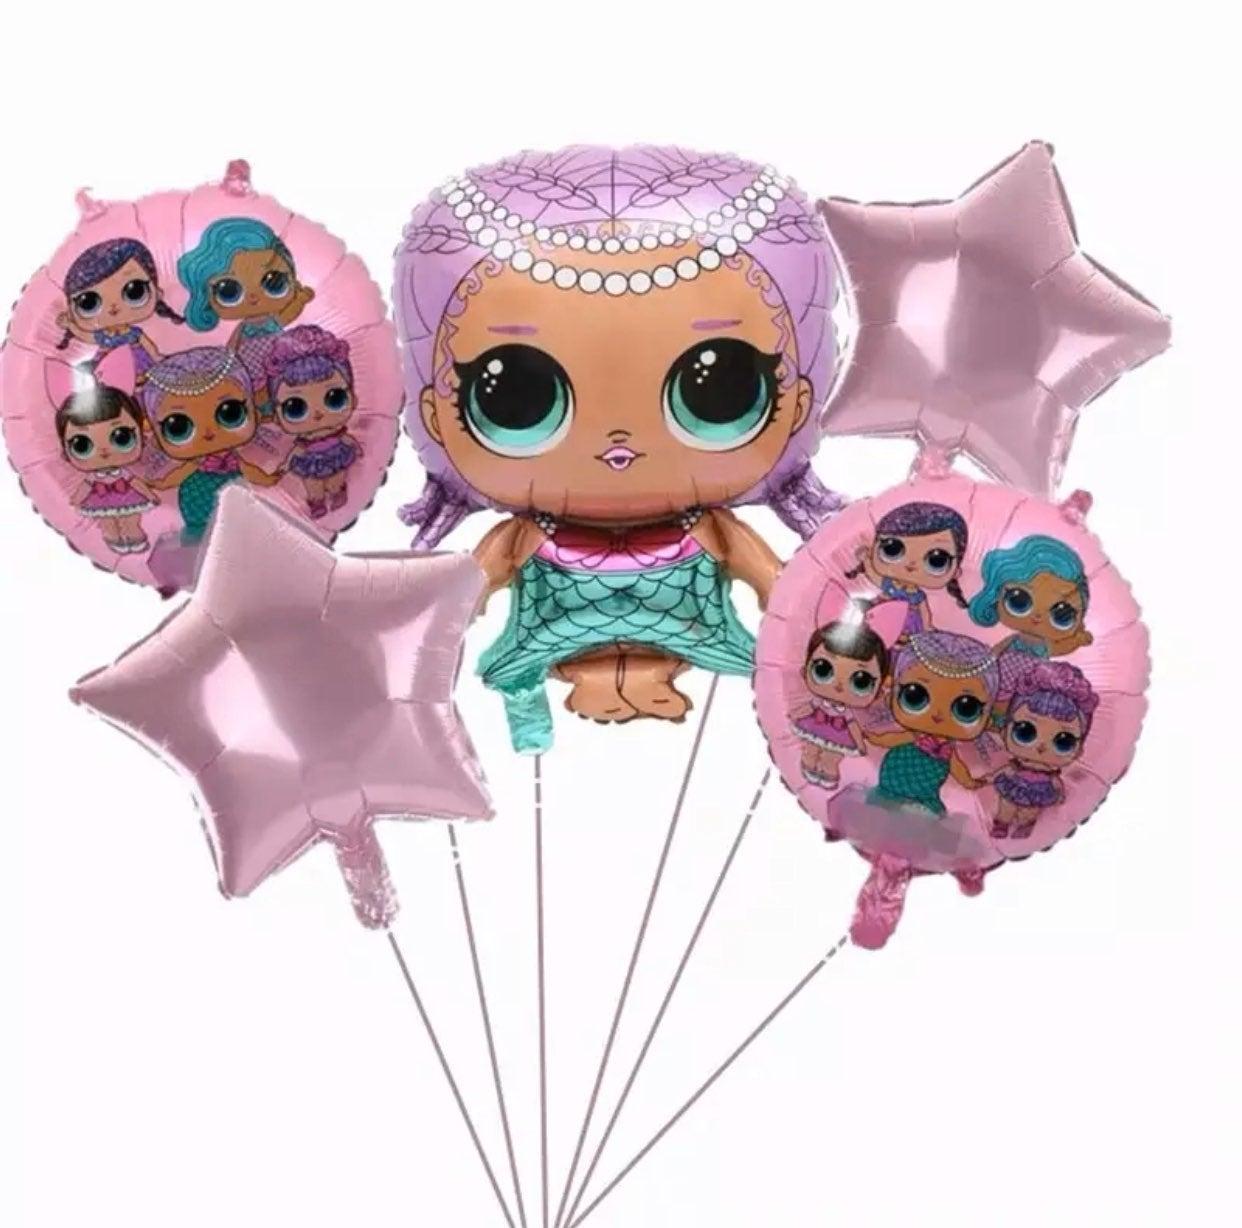 LoL 5pcs set Foil Balloons New.